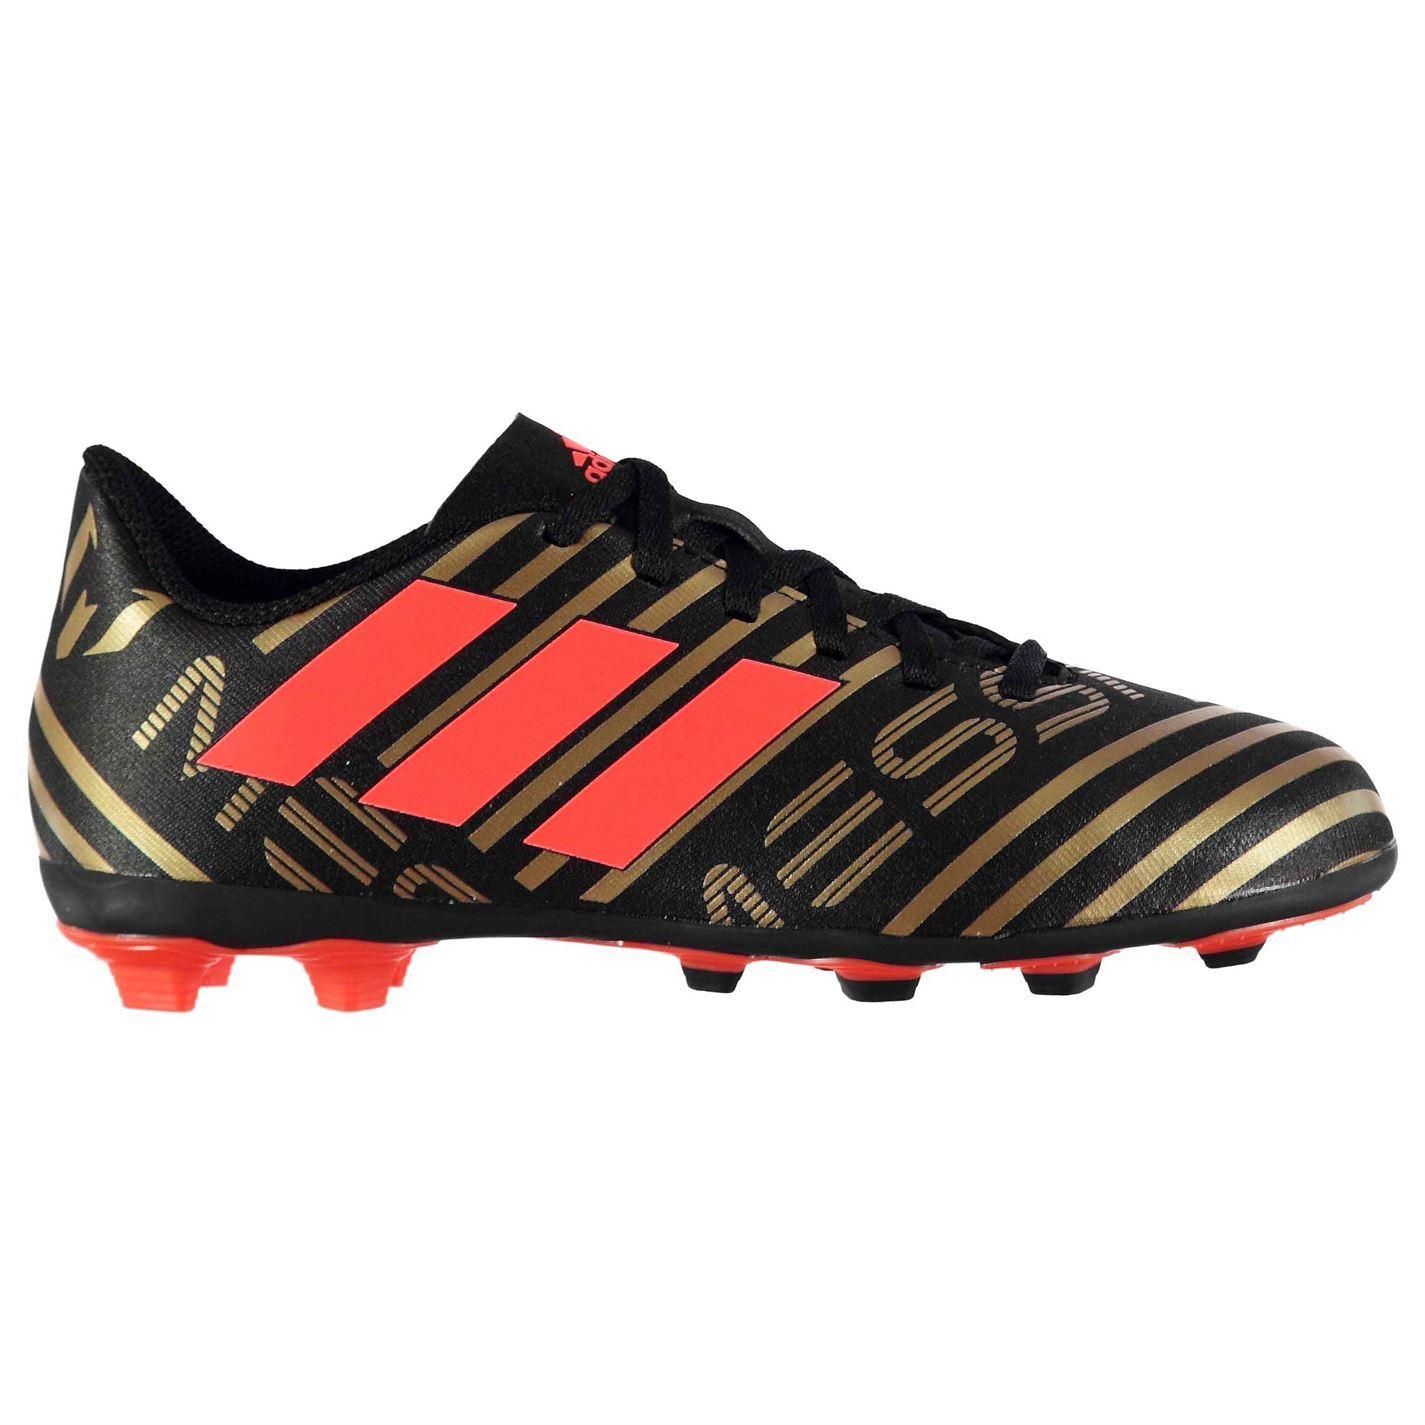 eb6f479be2 adidas Kids Nemeziz Messi 17.4 Childs FG Football Boots Firm Ground Lace Up